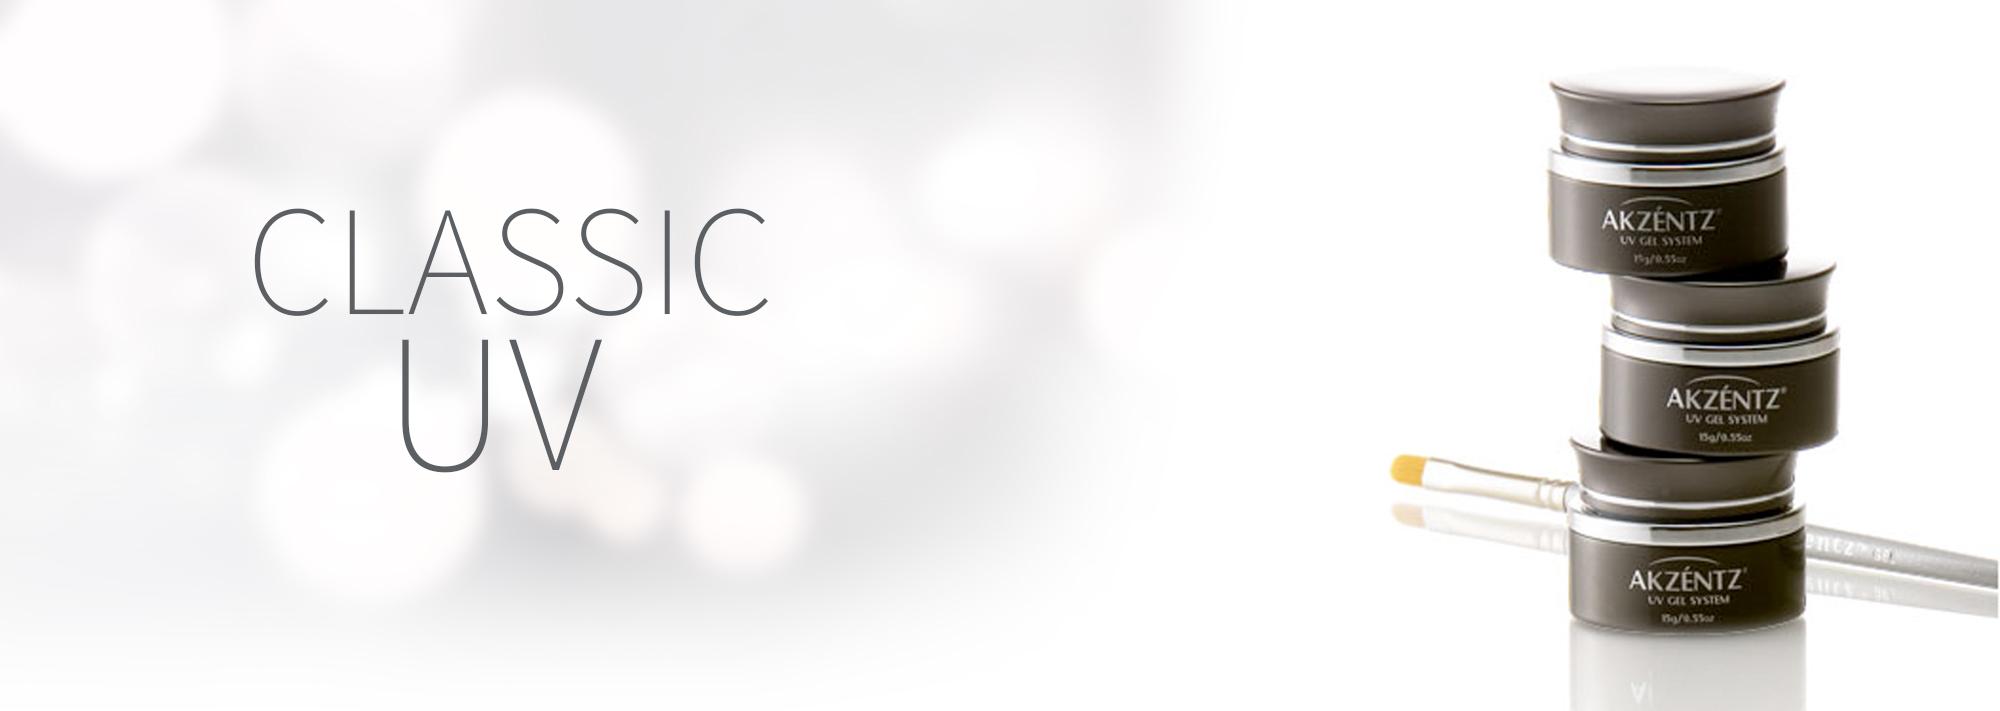 akzentz-classic-builder-gels-heading.jpg